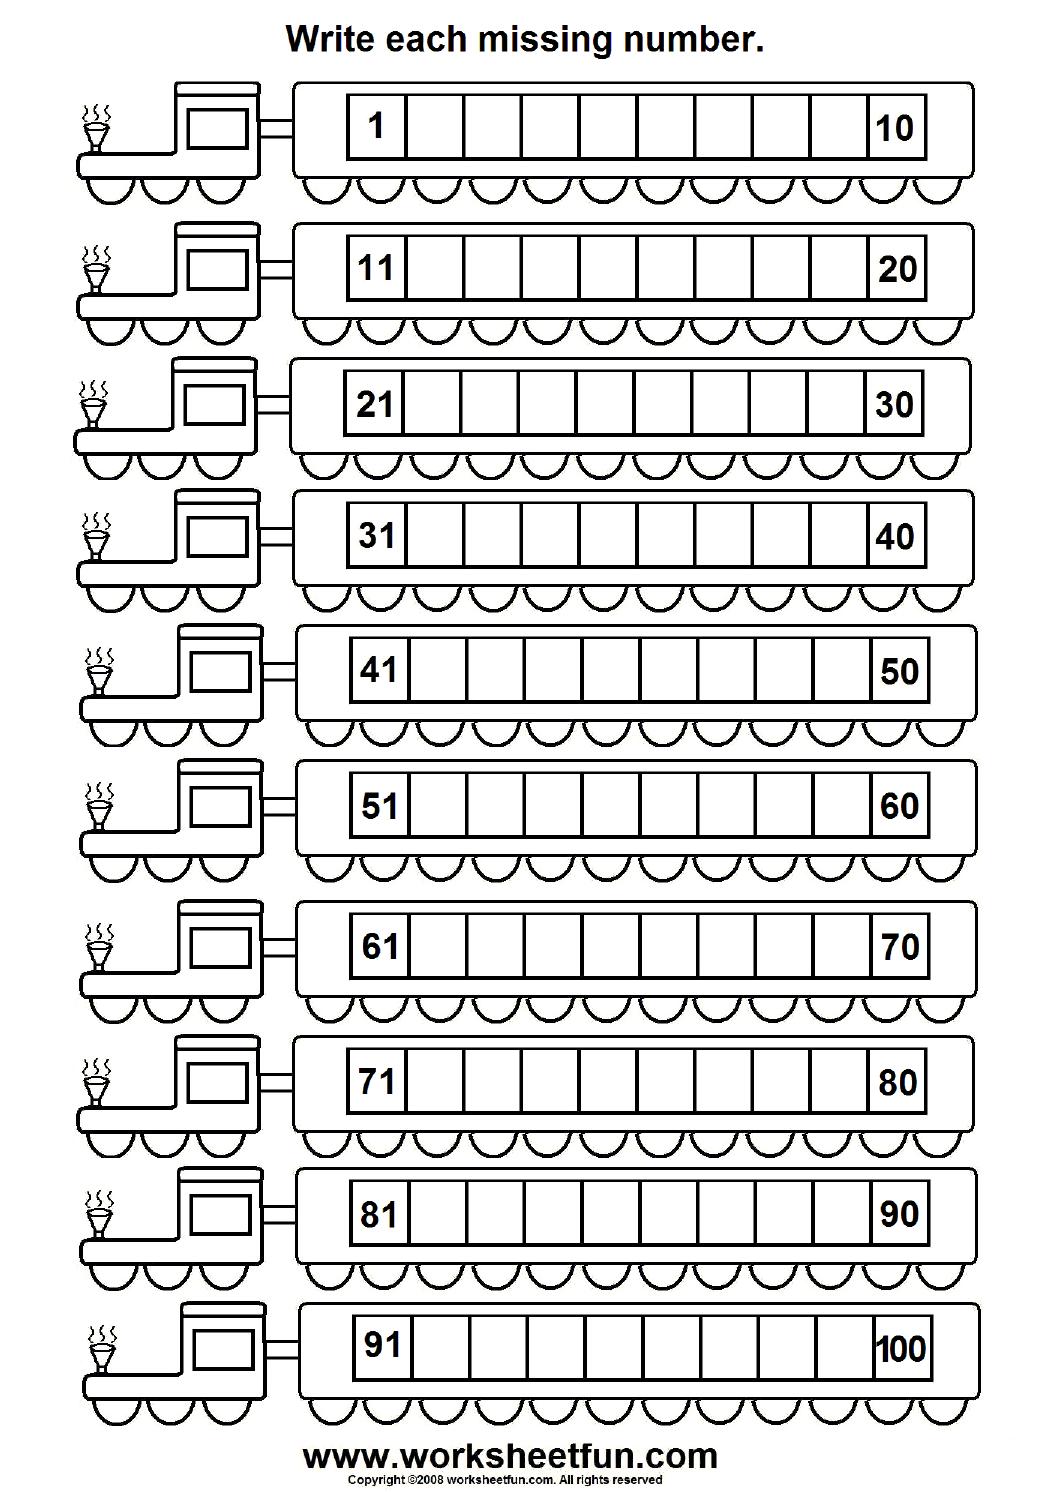 6 Best Images of Printable Number Worksheets 1 100 ...